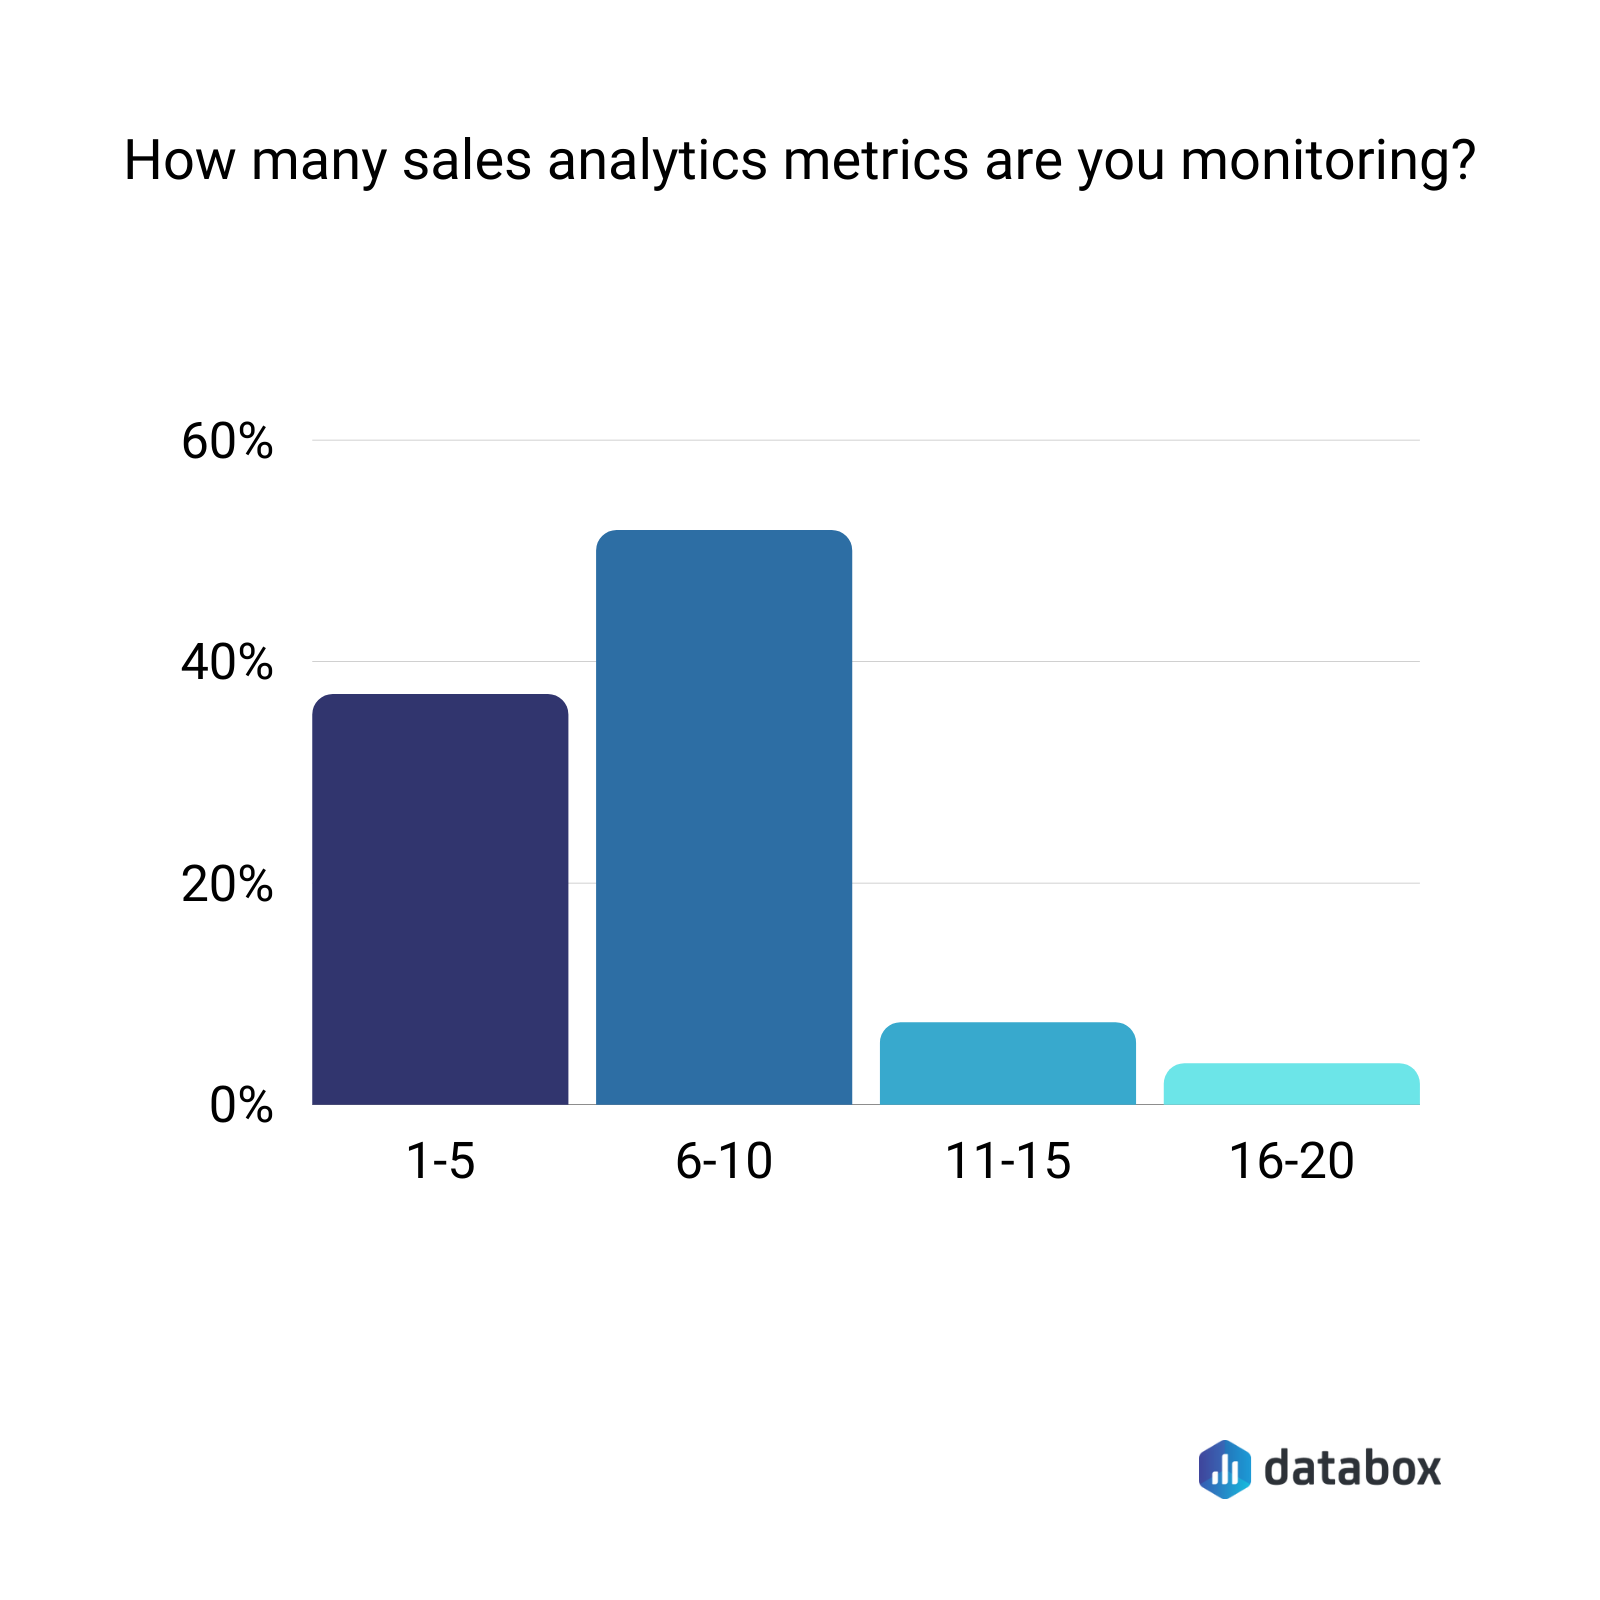 how many sales analytics metrics are you monitoring?